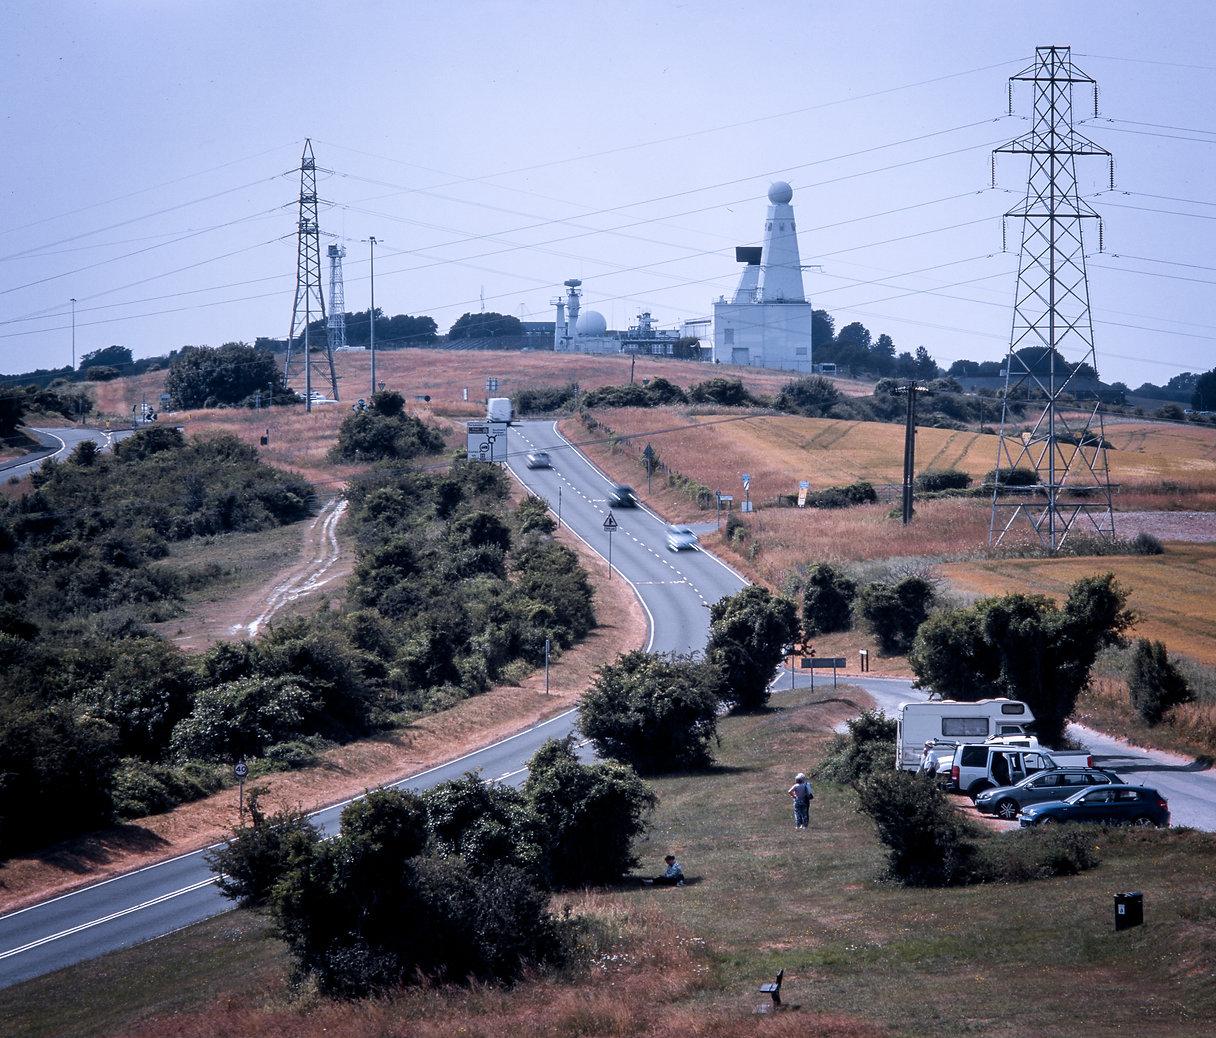 Fort Widley004-6.jpg